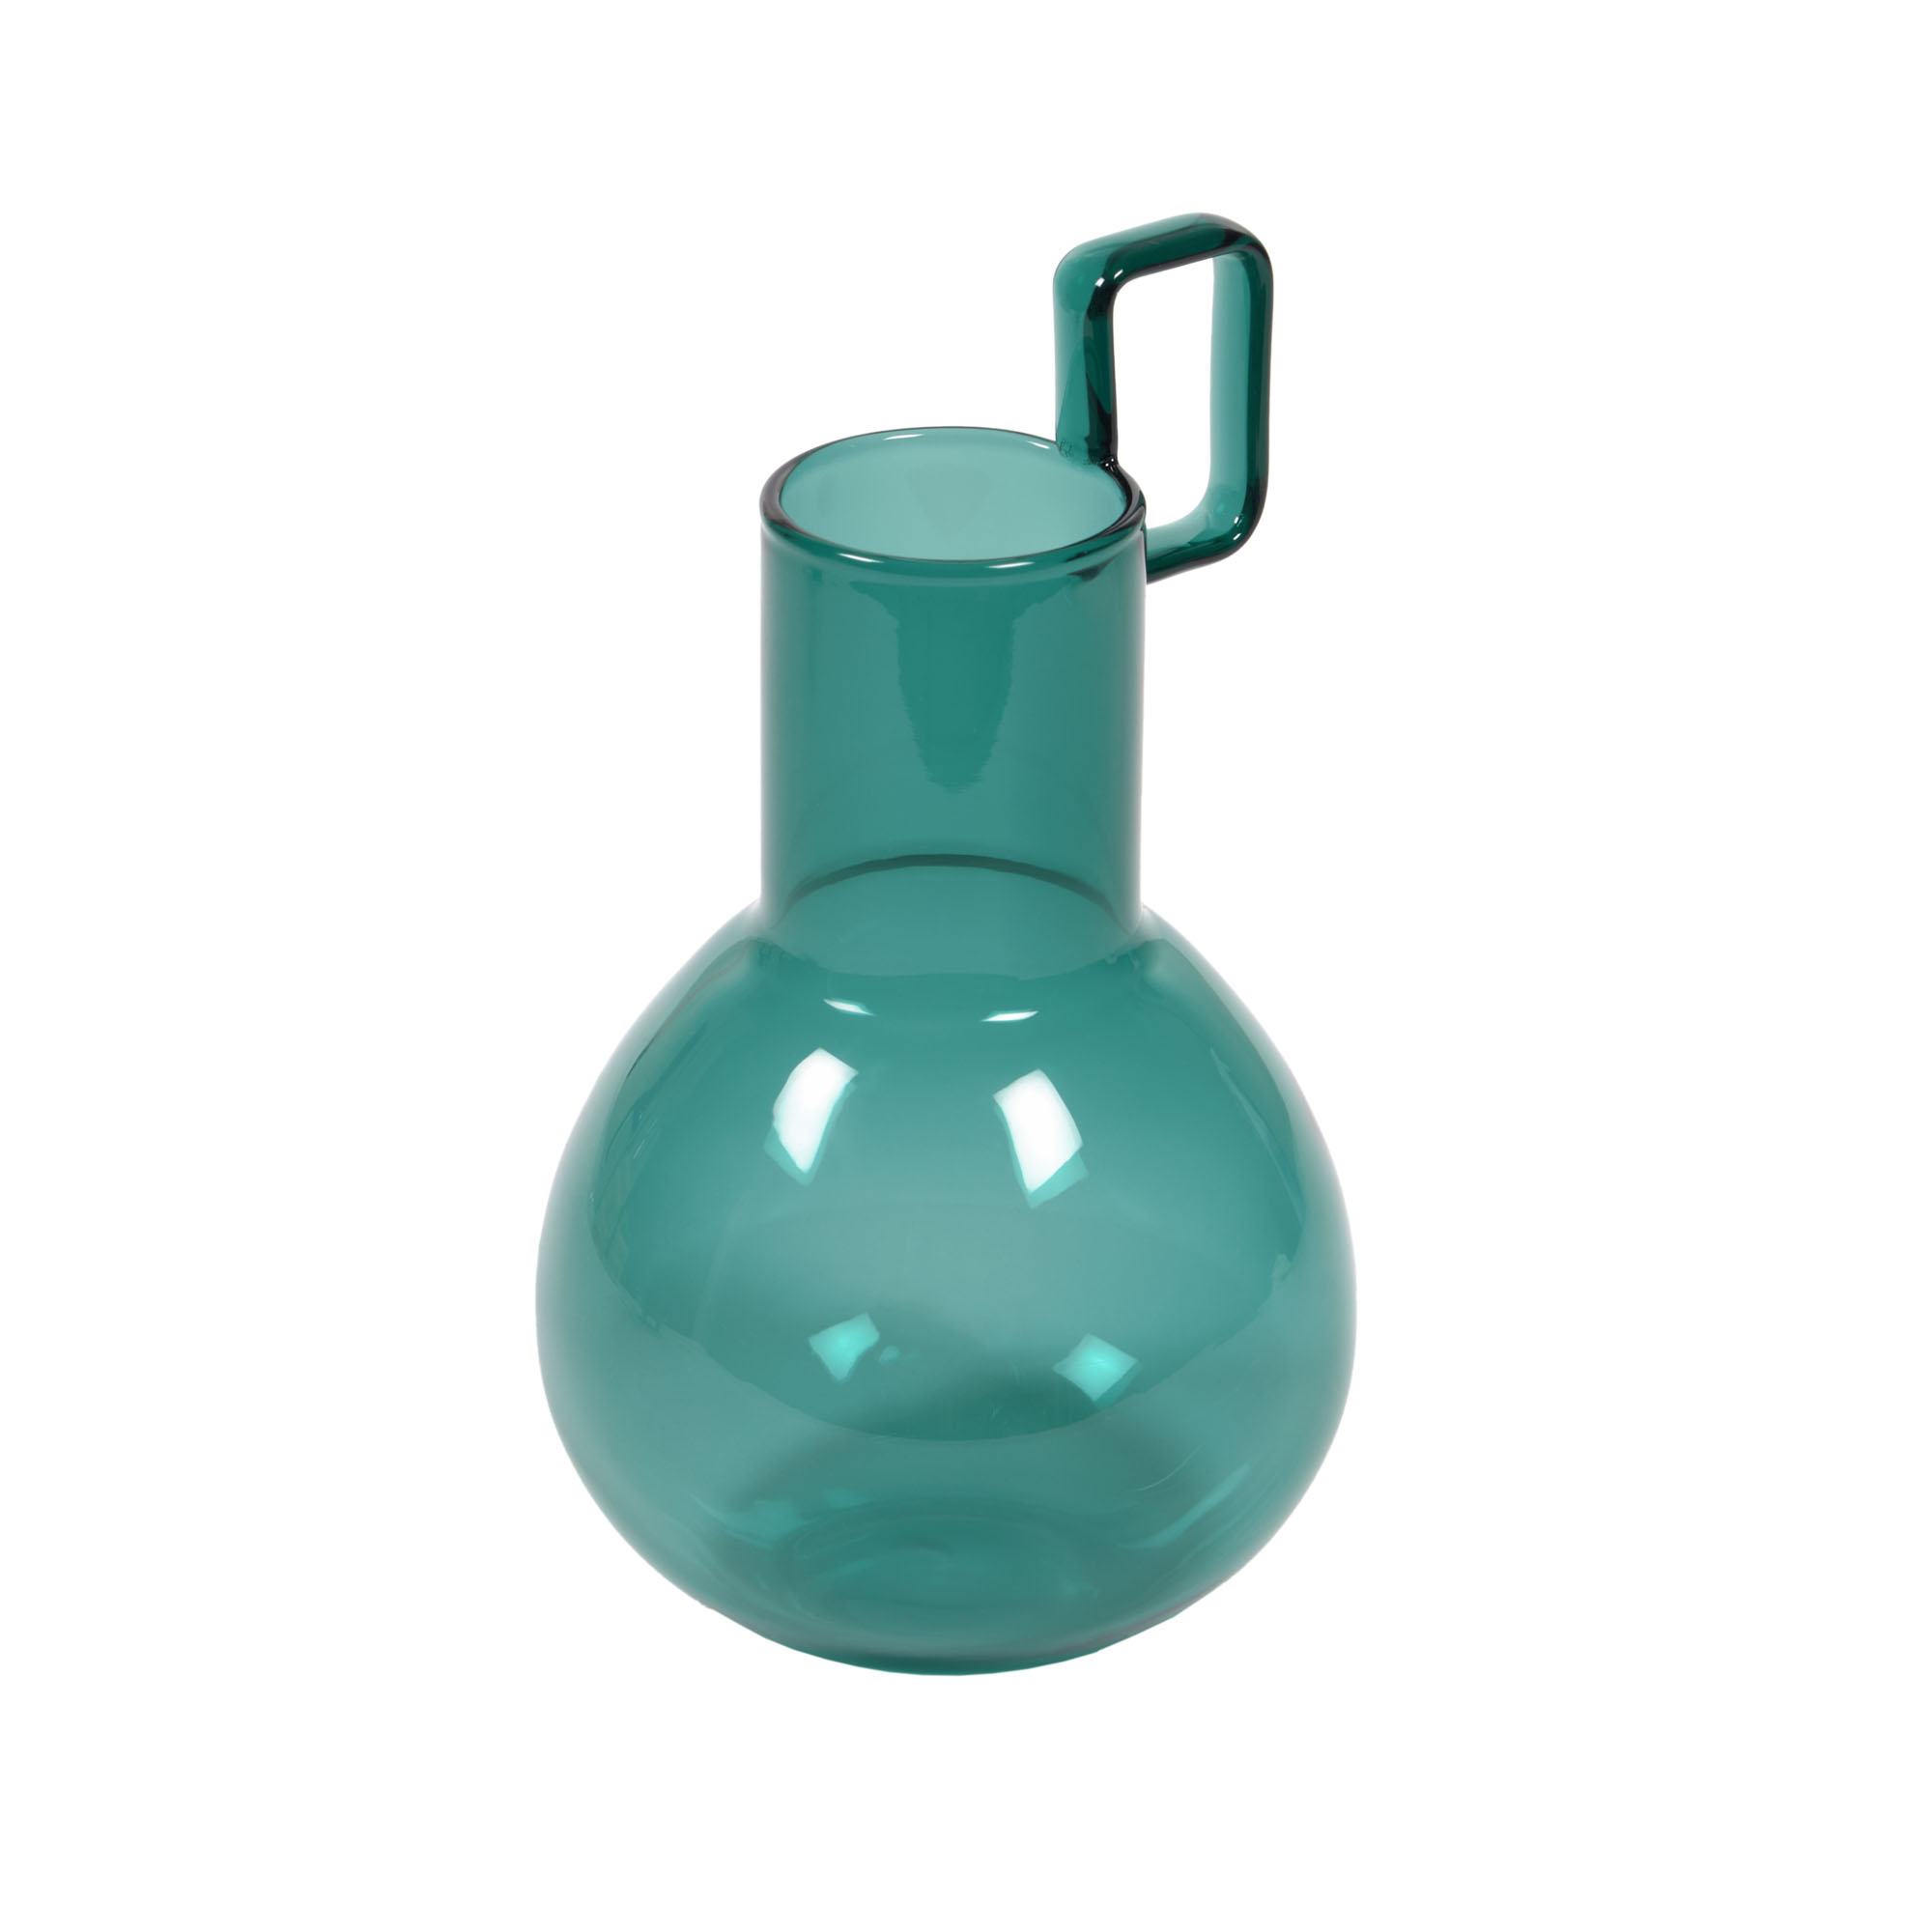 Kave home - vase iarena verre turquoise 16,5 cm